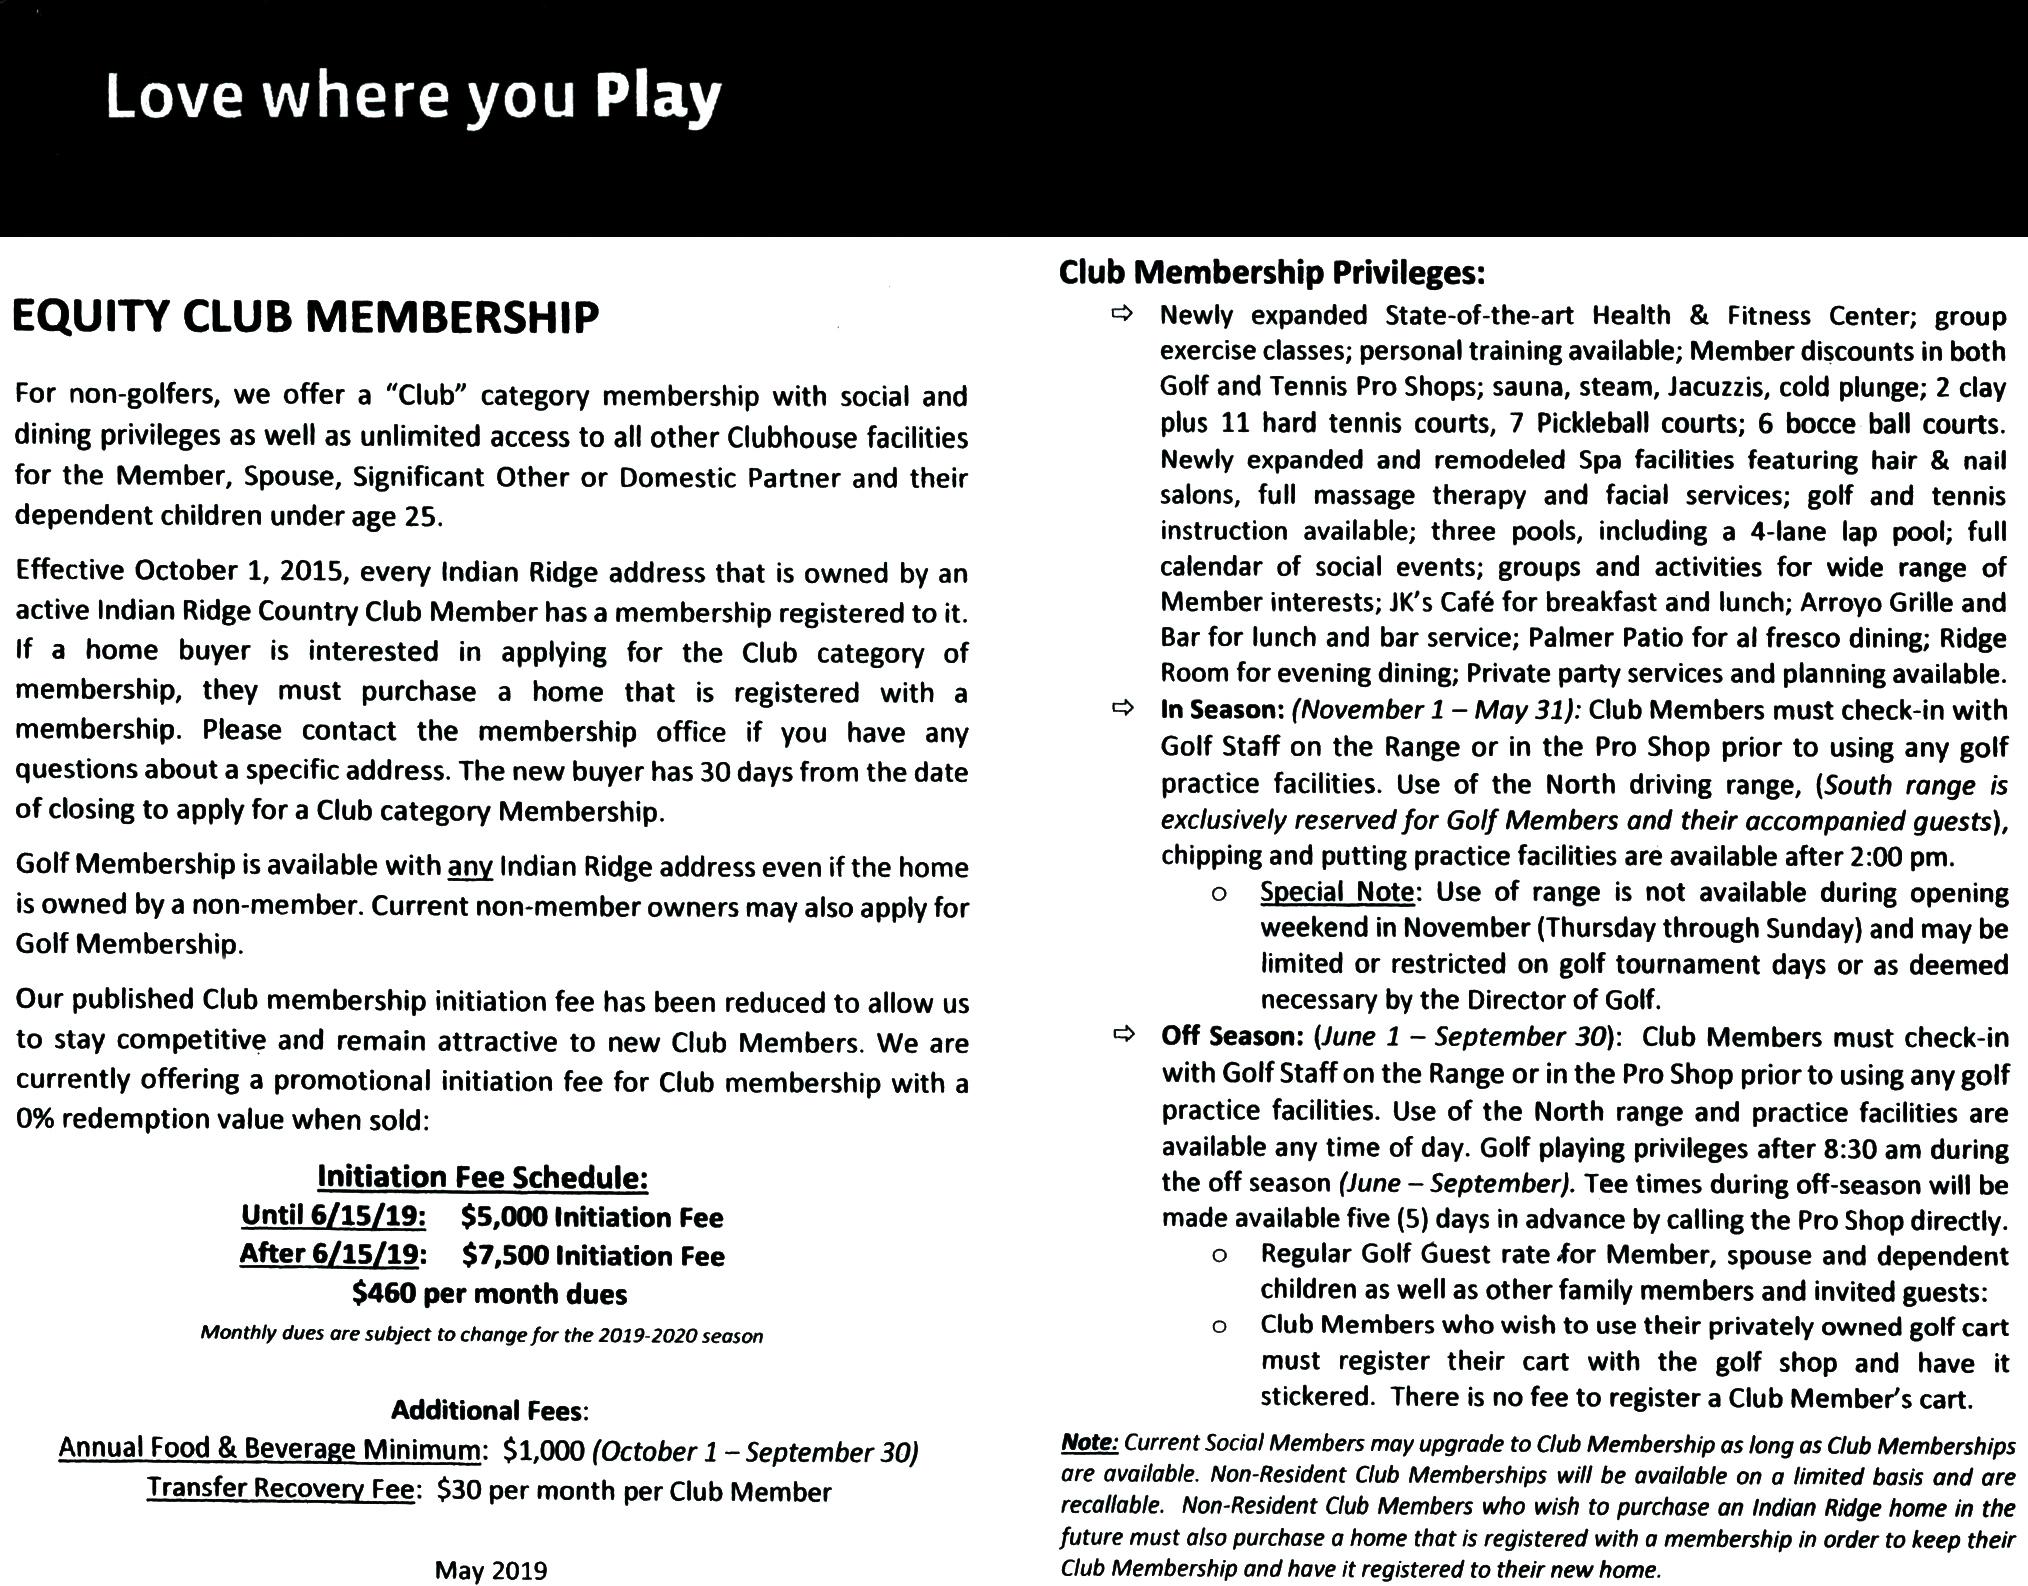 IRCC Equity Club Membership